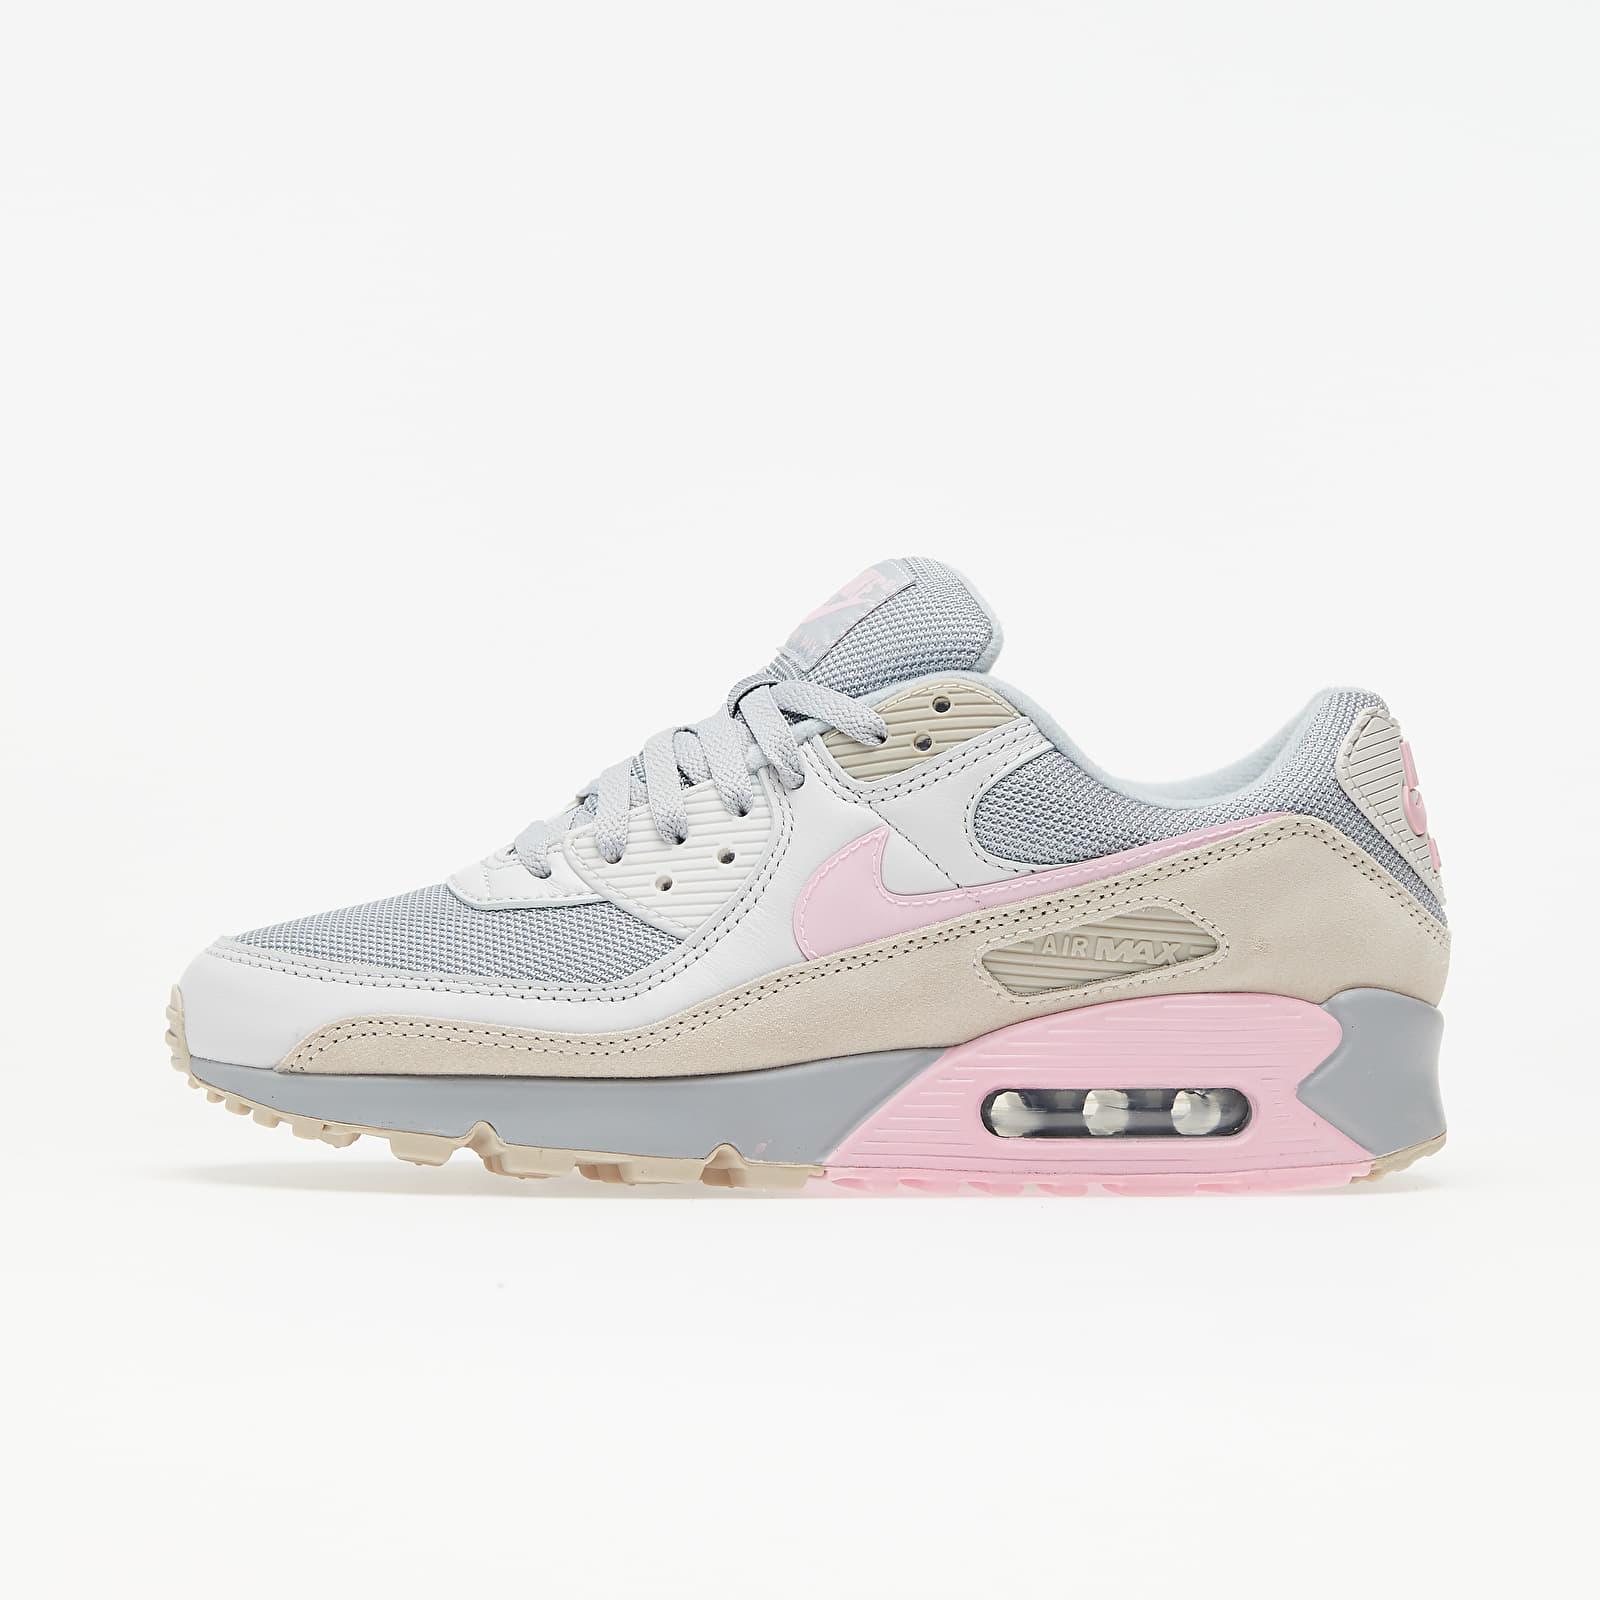 Men's shoes Nike Air Max 90 Vast Grey/ Pink-Wolf Grey-String